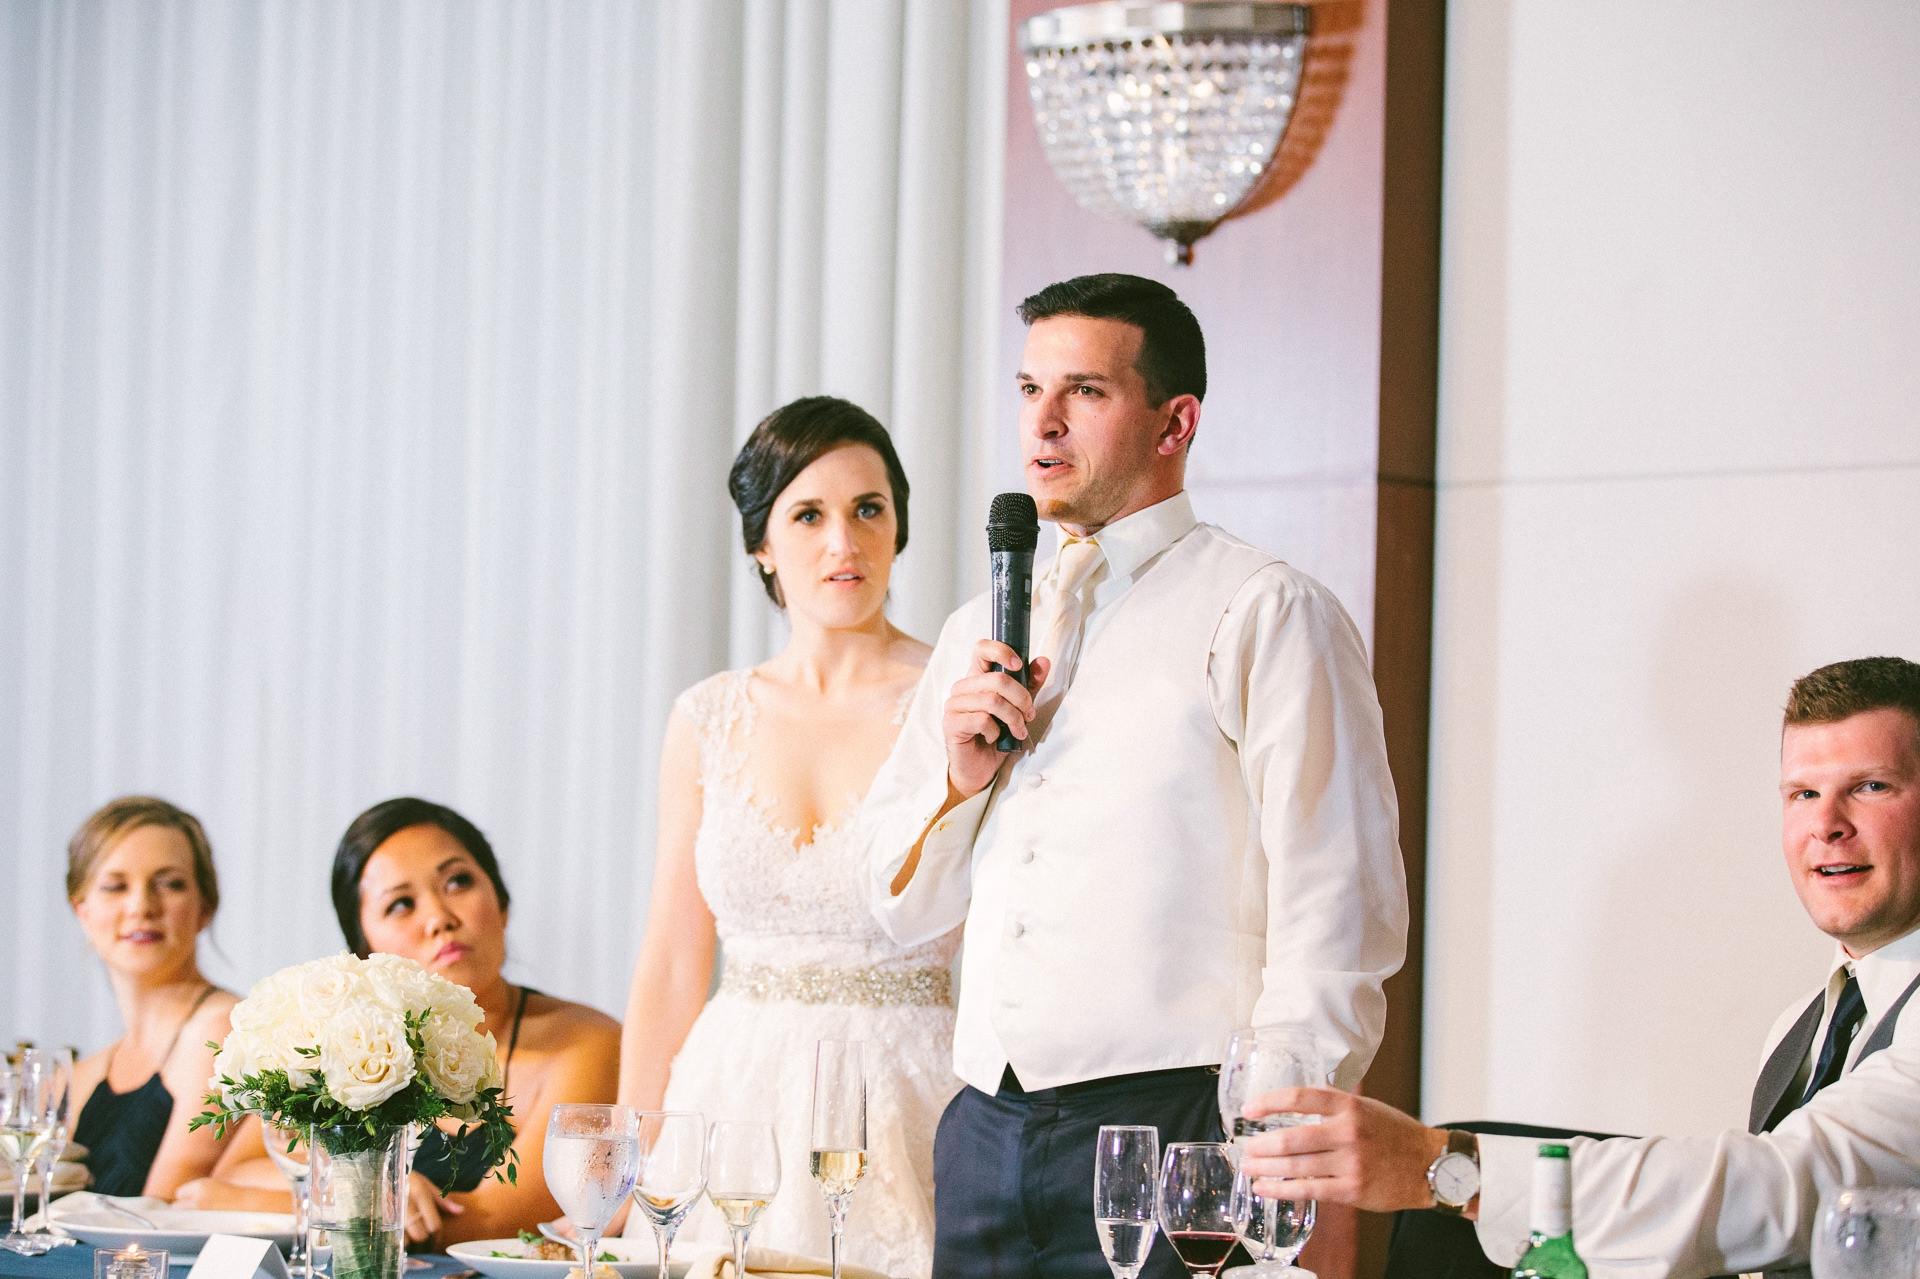 Intercontinental Hotel Wedding in Cleveland 2 38.jpg